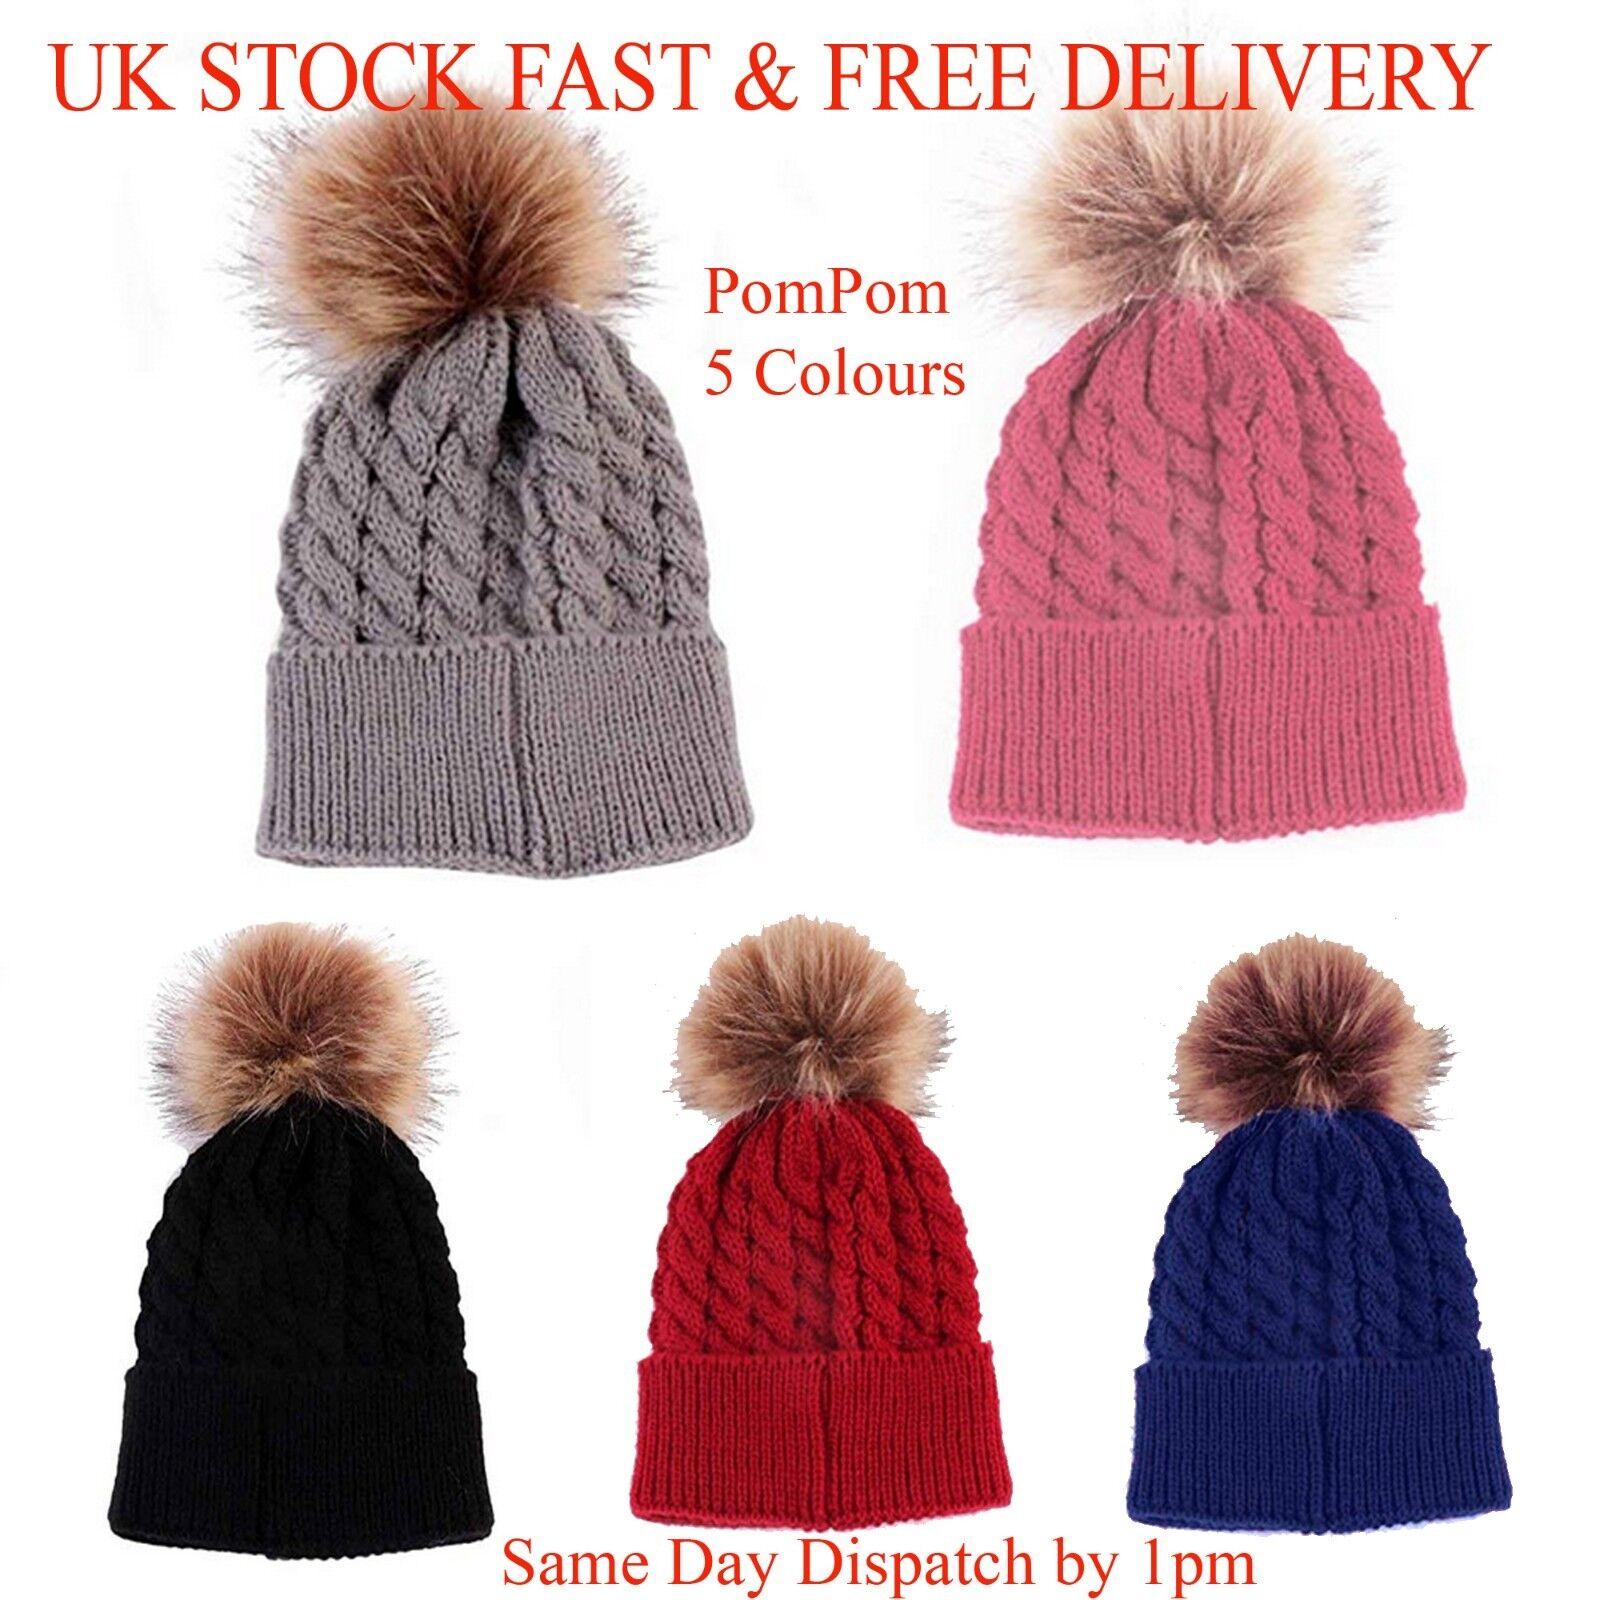 Faux de la mujer piel invierno cálido punto punto Bobble Pom Pom Beanie  Bobble holgados mullida bola Crochet esquí Cap sombrero Reino Unido STOCK 145226d9e90